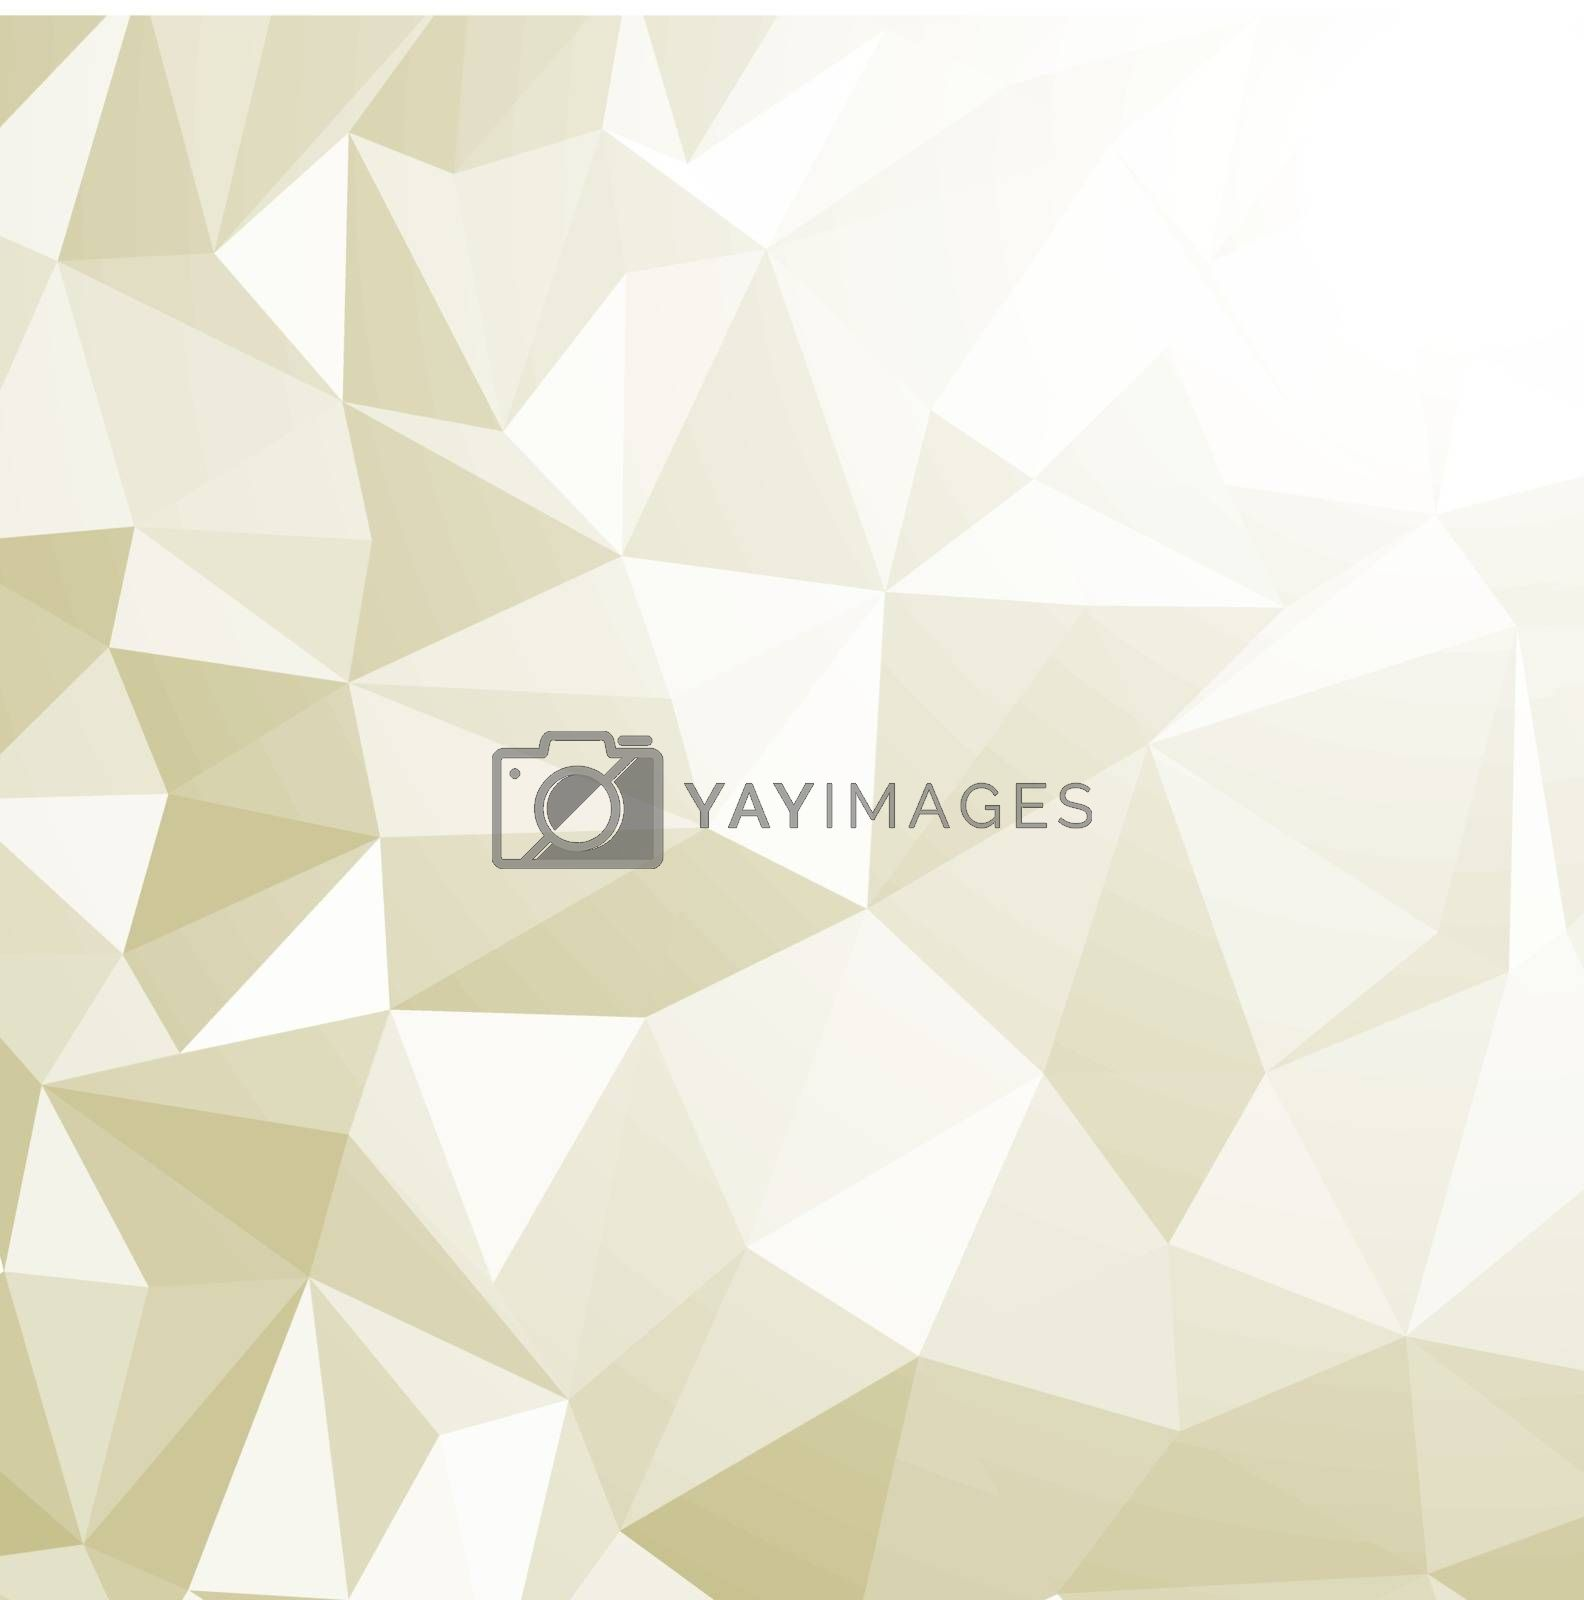 Old crushed elegant color paper background. EPS 8 vector file included